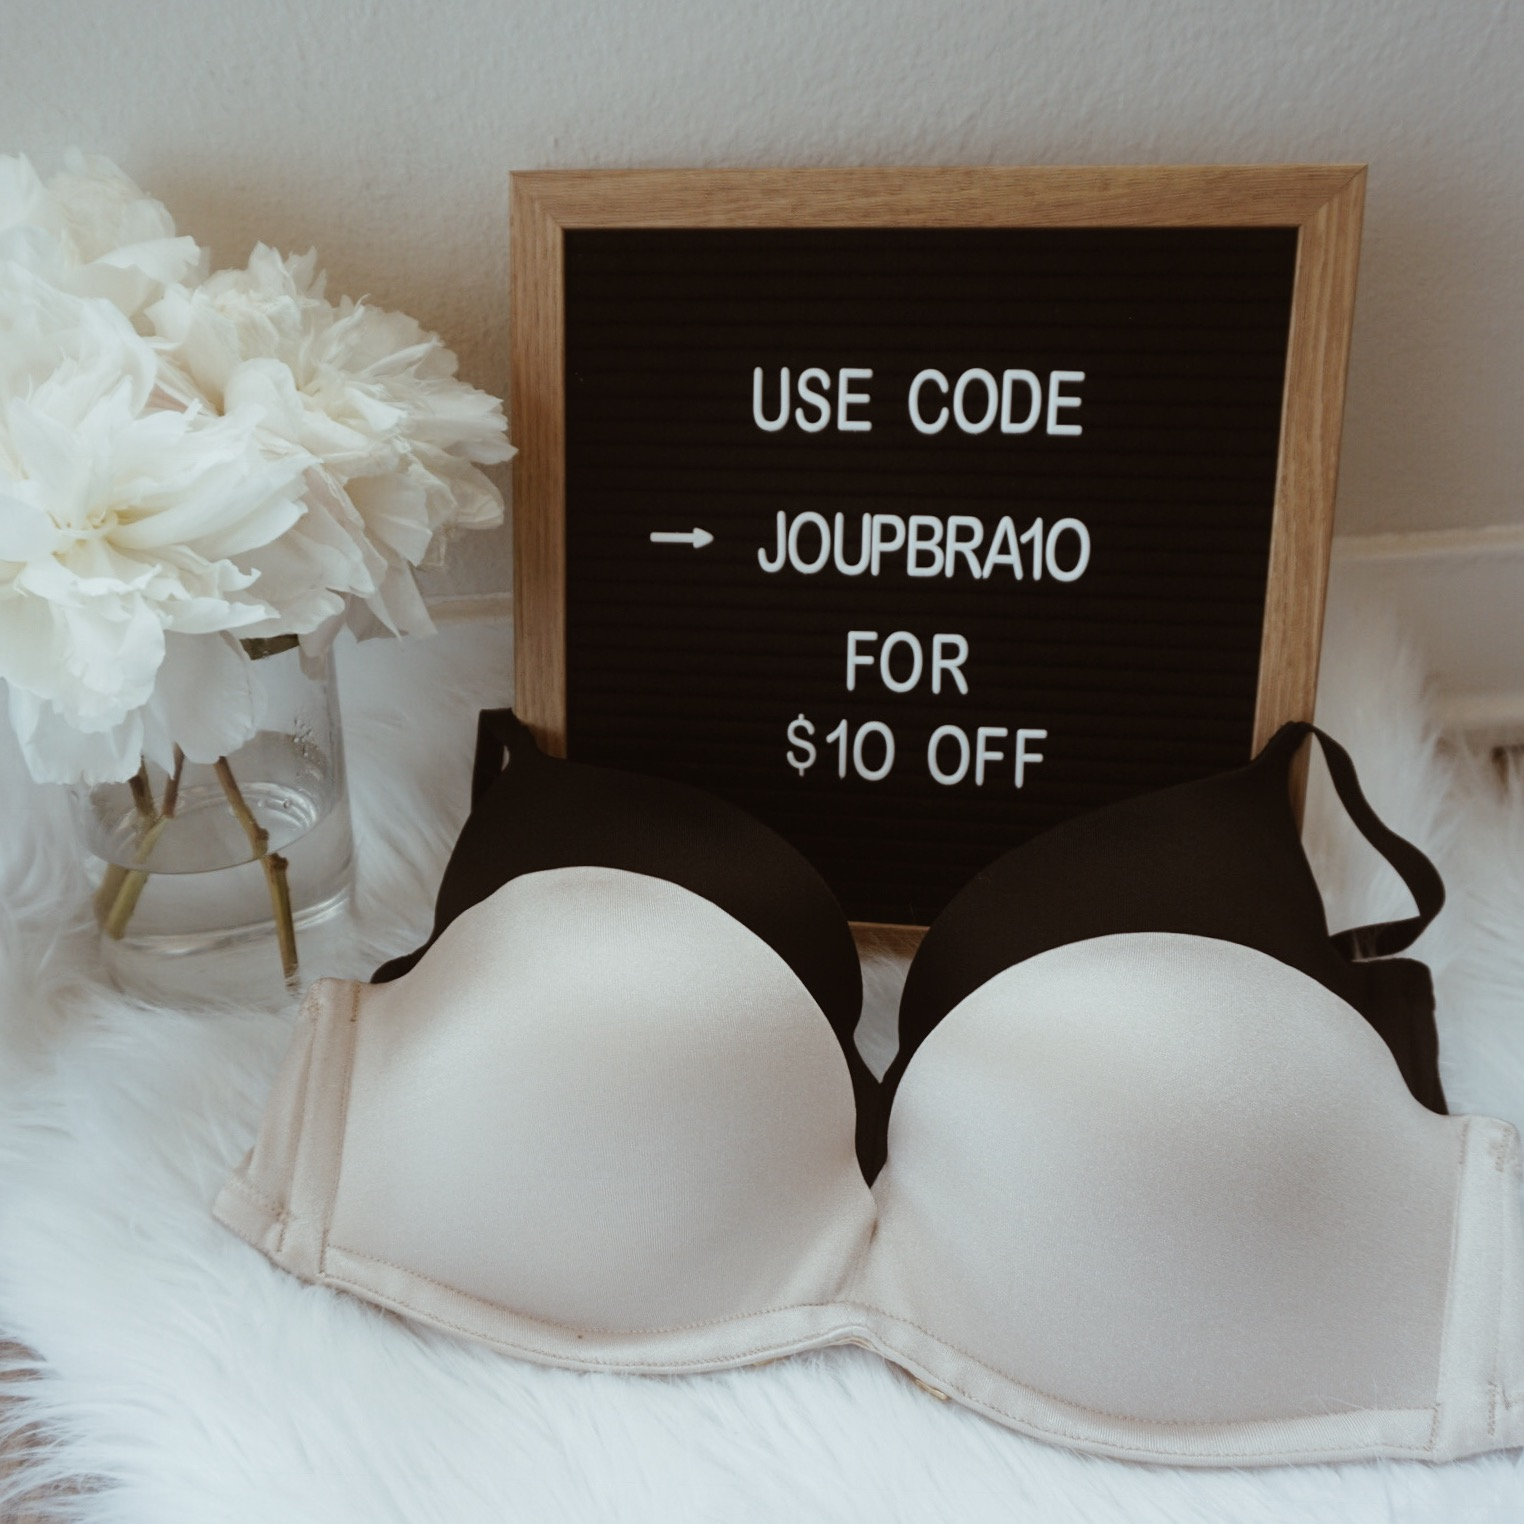 Upbra Promo Code - Le Fab Chic